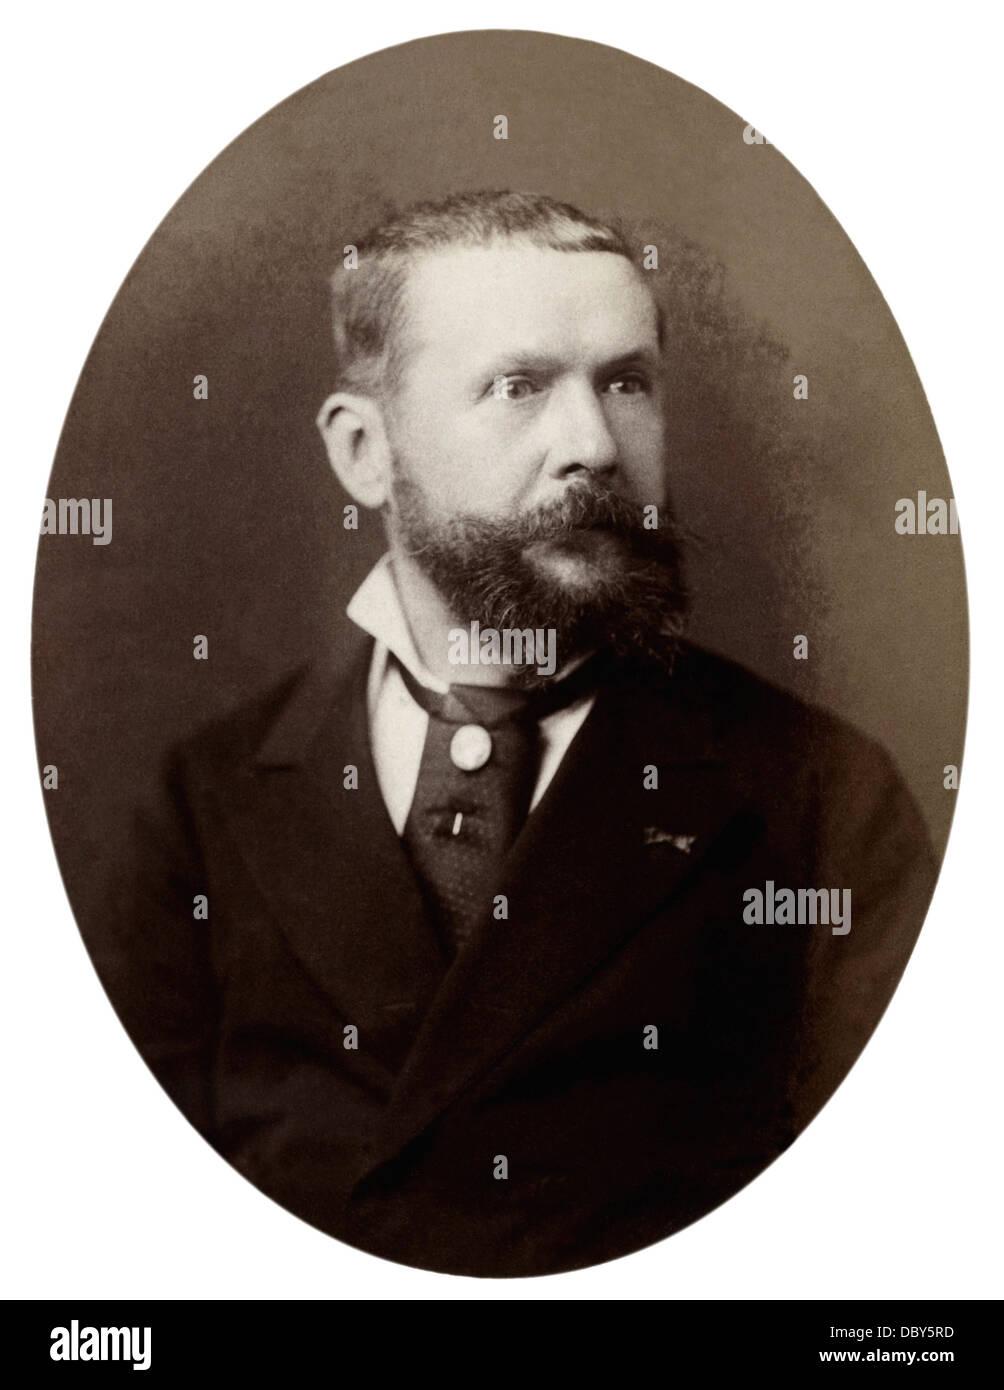 Gaston Tissandier (1843 - 1899), french scientist and balloonist. - Stock Image